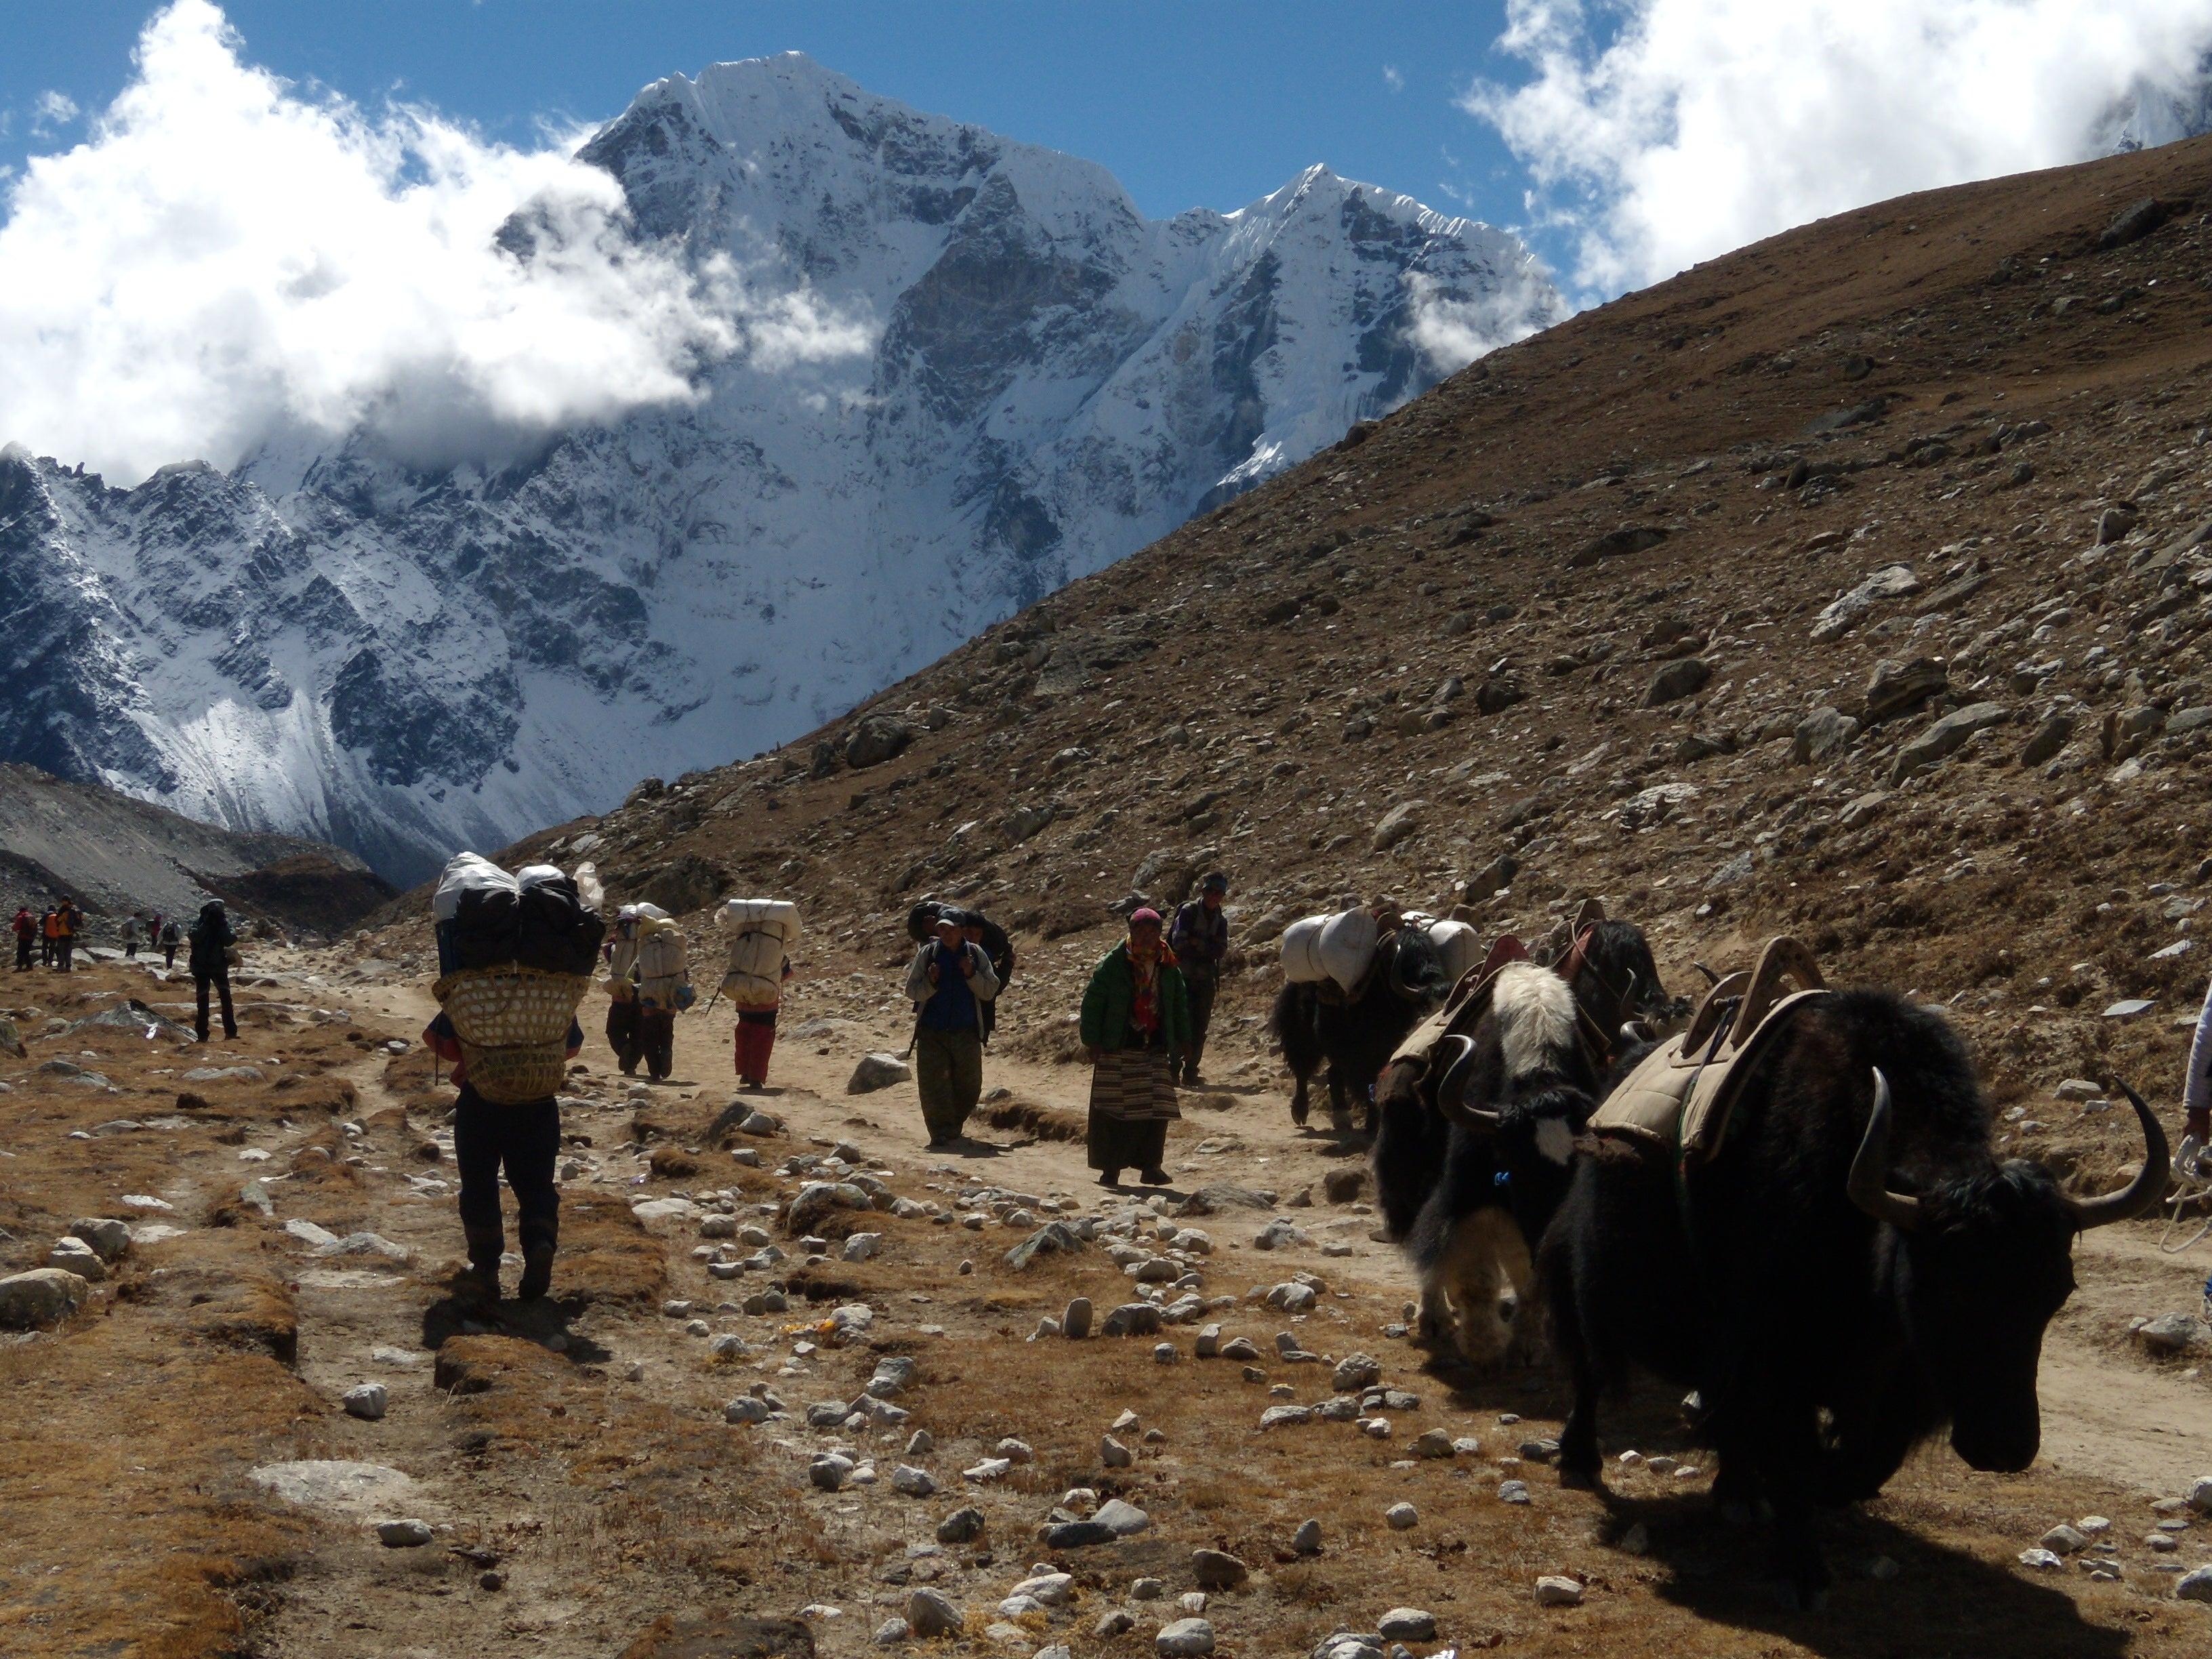 Into The Khumbu: Ama Dablam